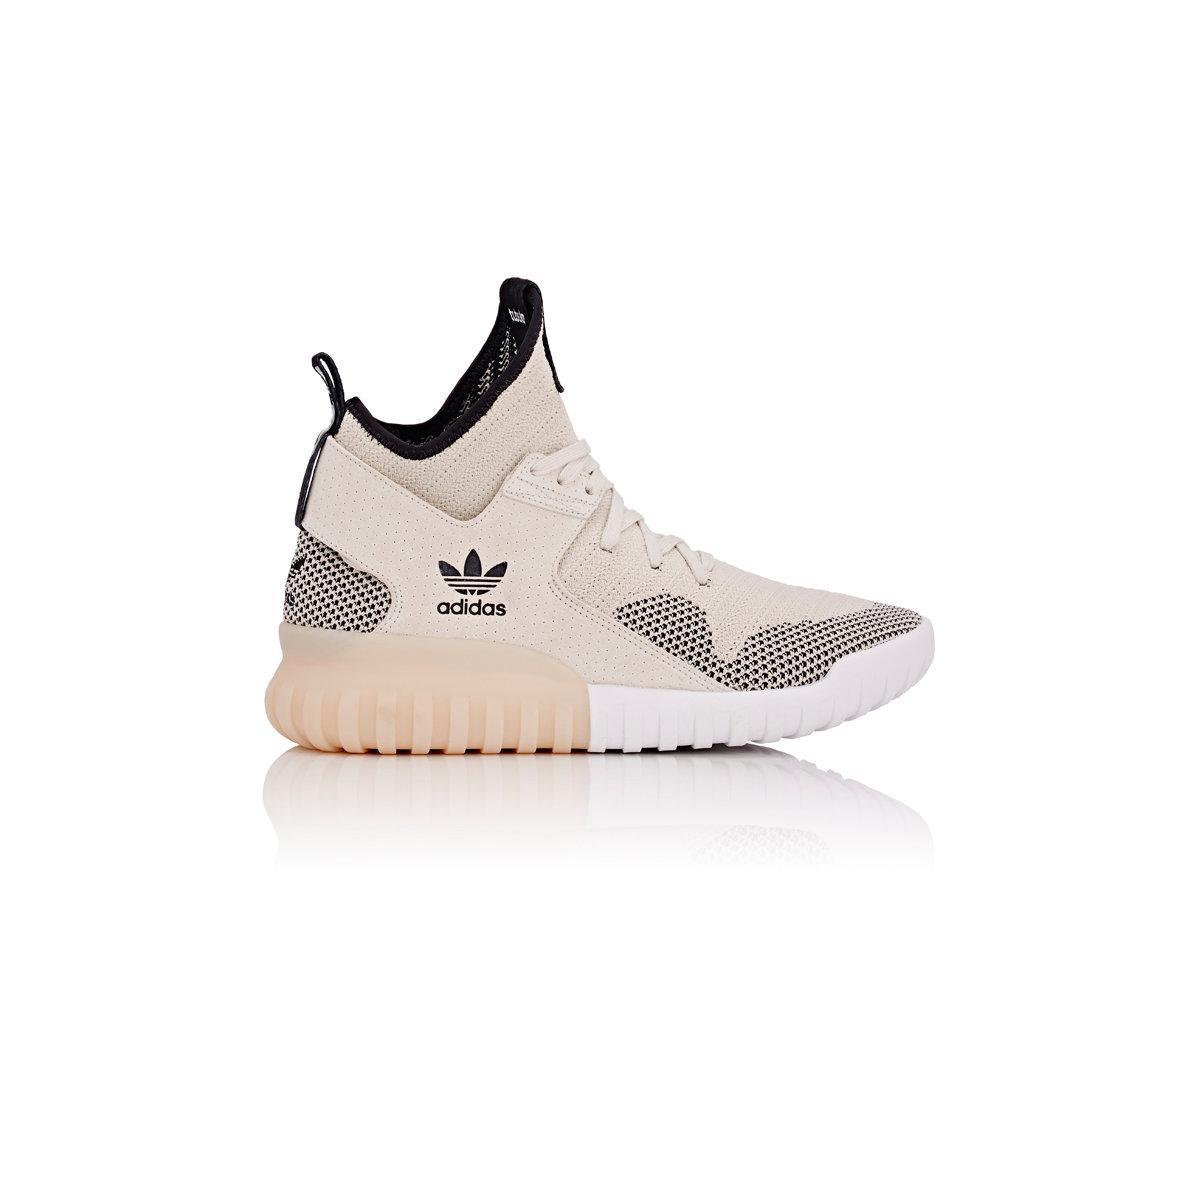 dcf0b602feb9 Adidas originals X Tubular X originals Sneakers in Blanco for Hombre ...